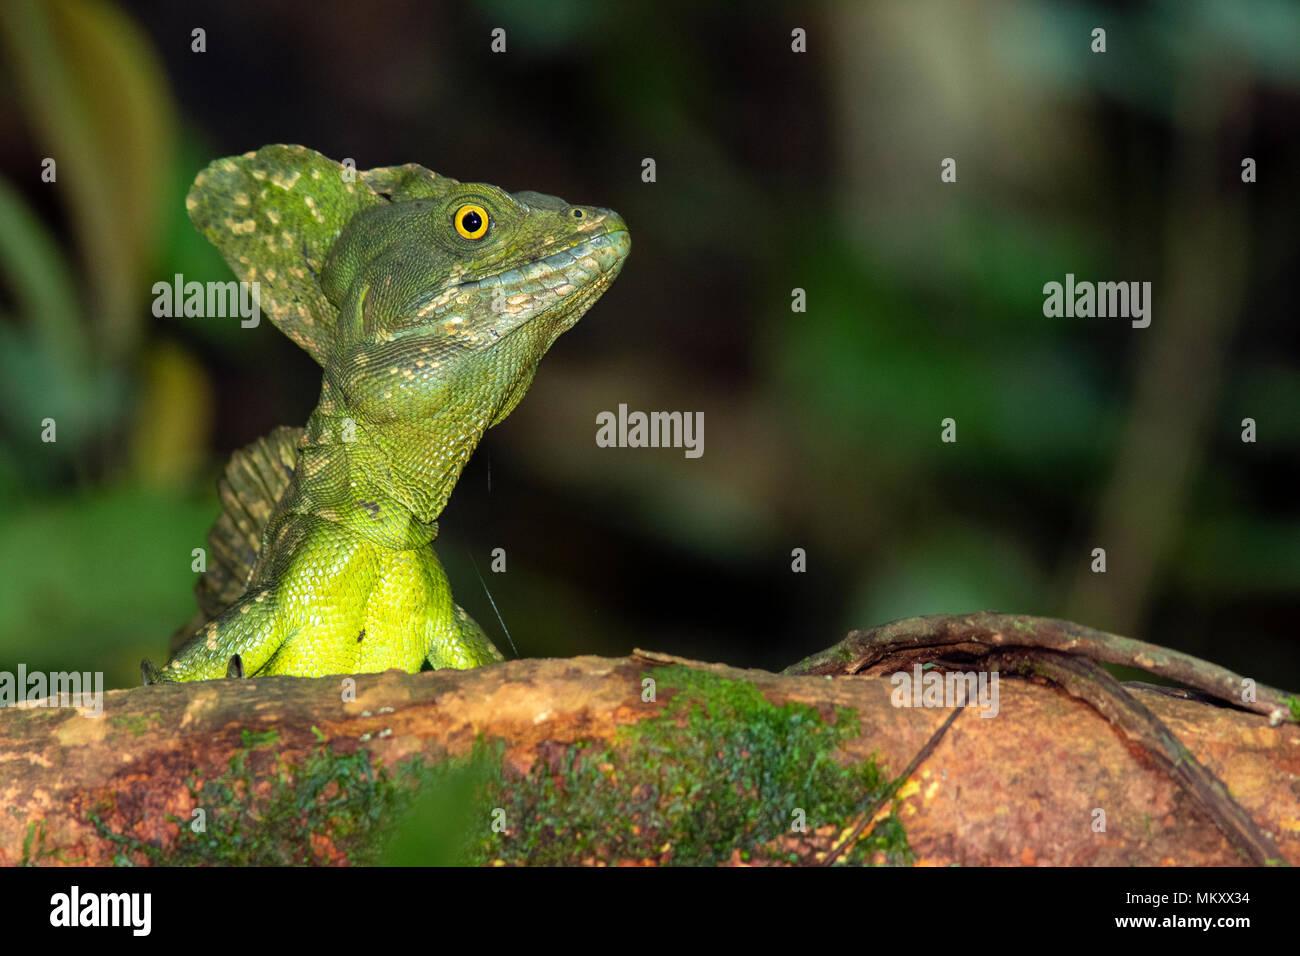 Plumed basilisk (Basiliscus plumifrons) - La Laguna del Lagarto Lodge, Boca Tapada, Costa Rica Stock Photo